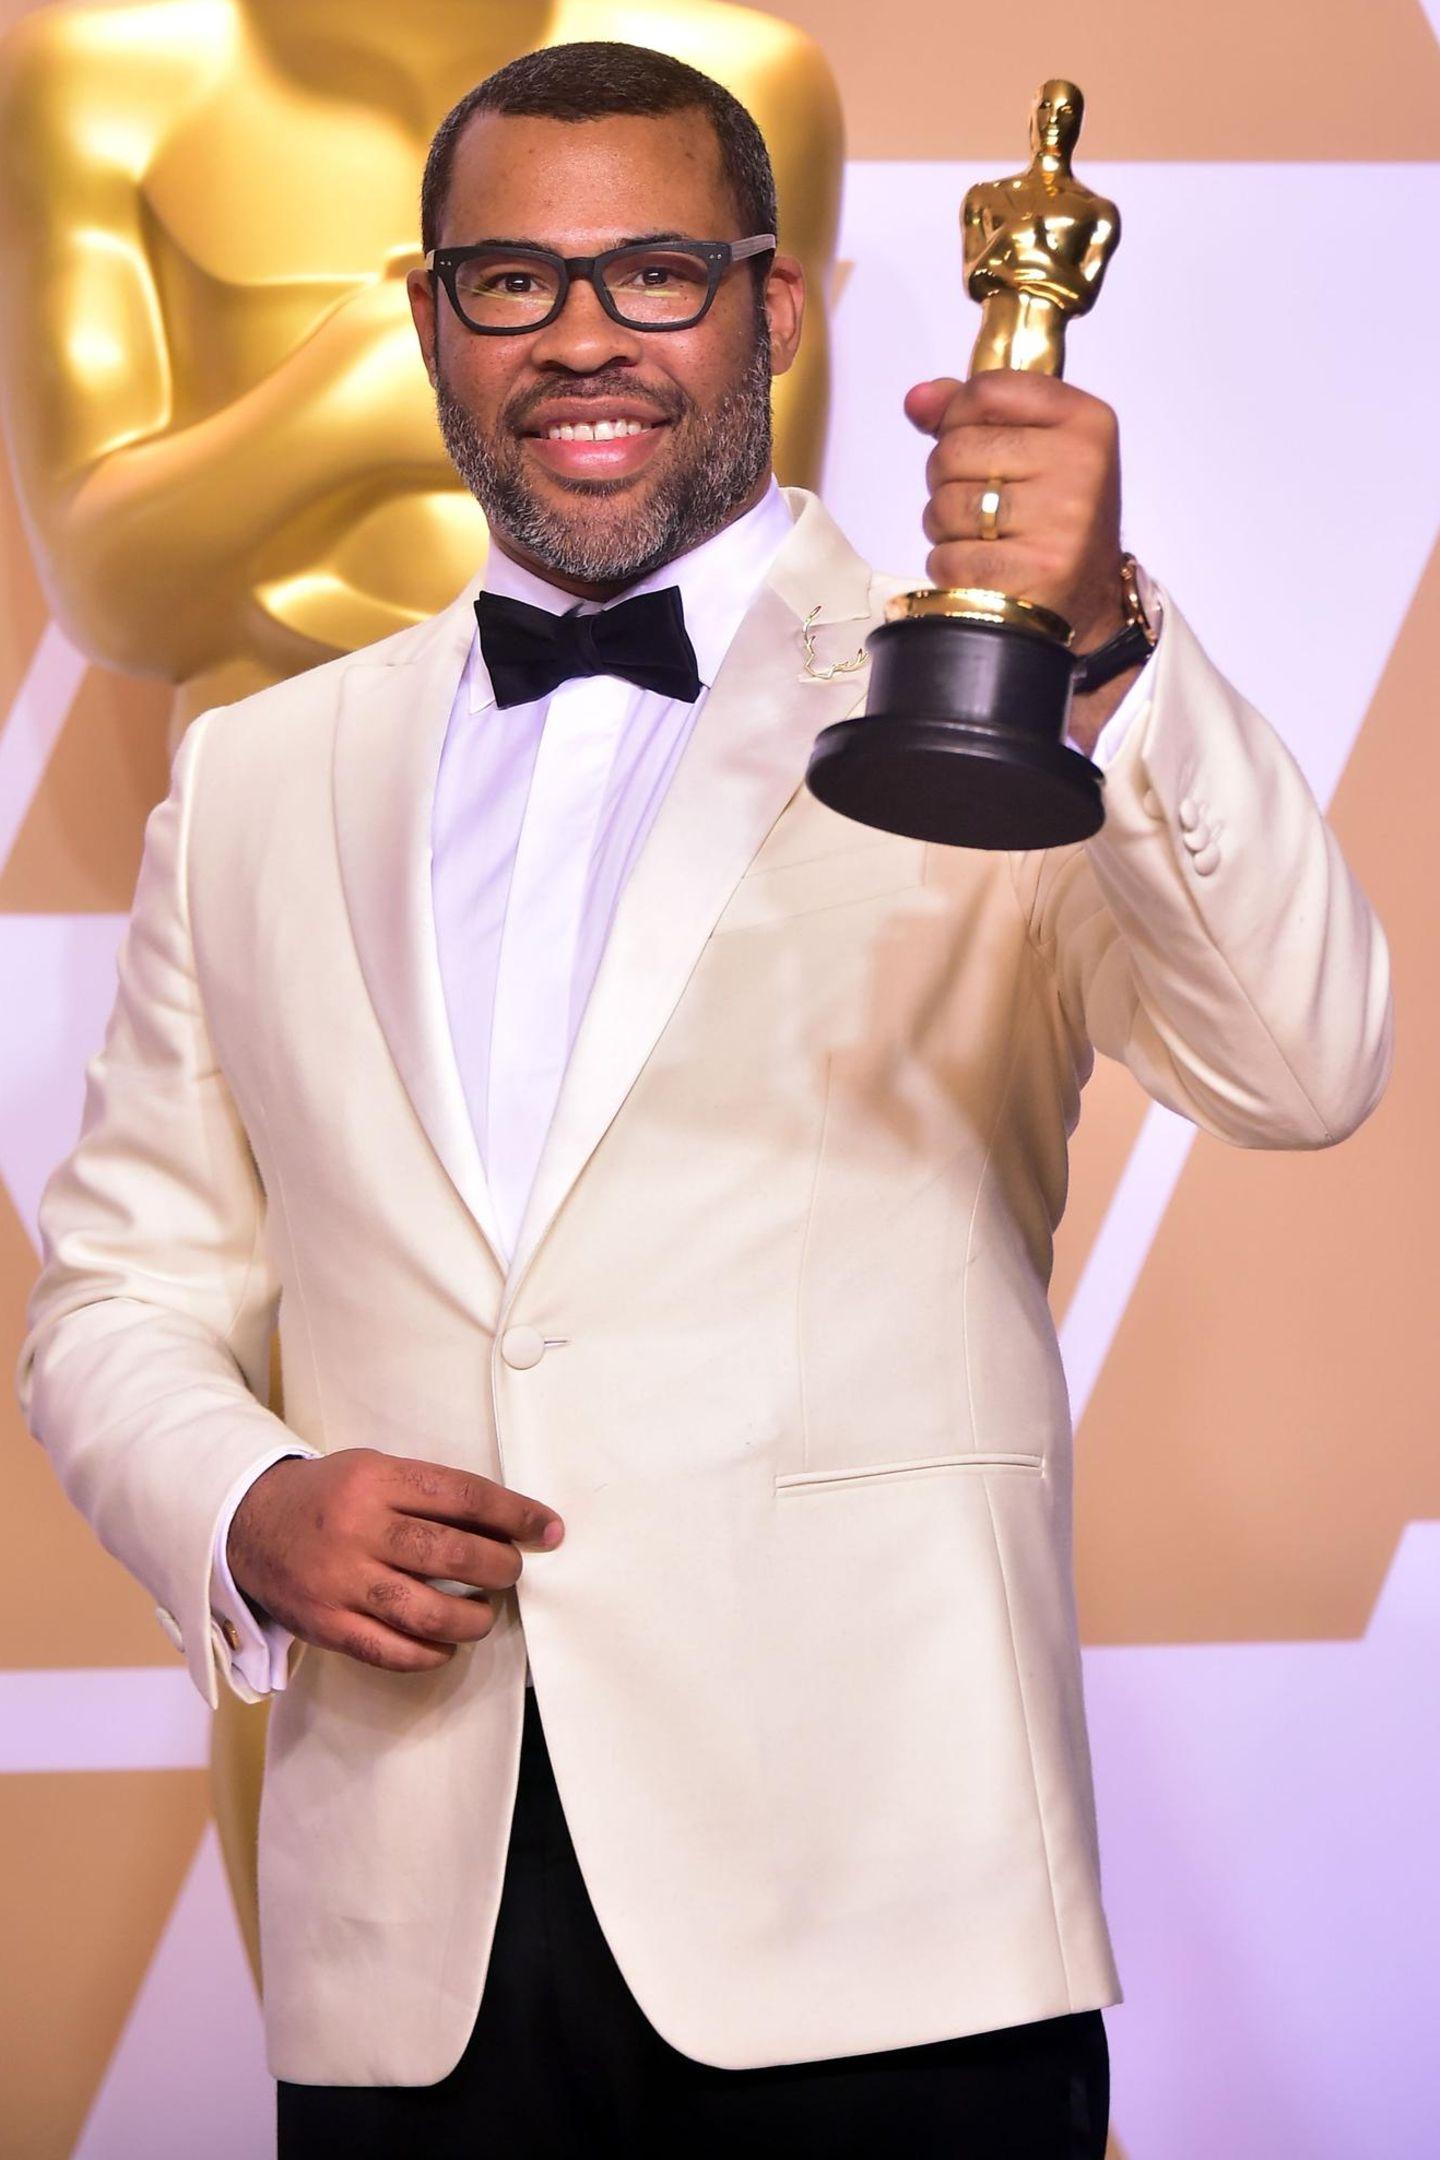 Wann Sind Die Oscars